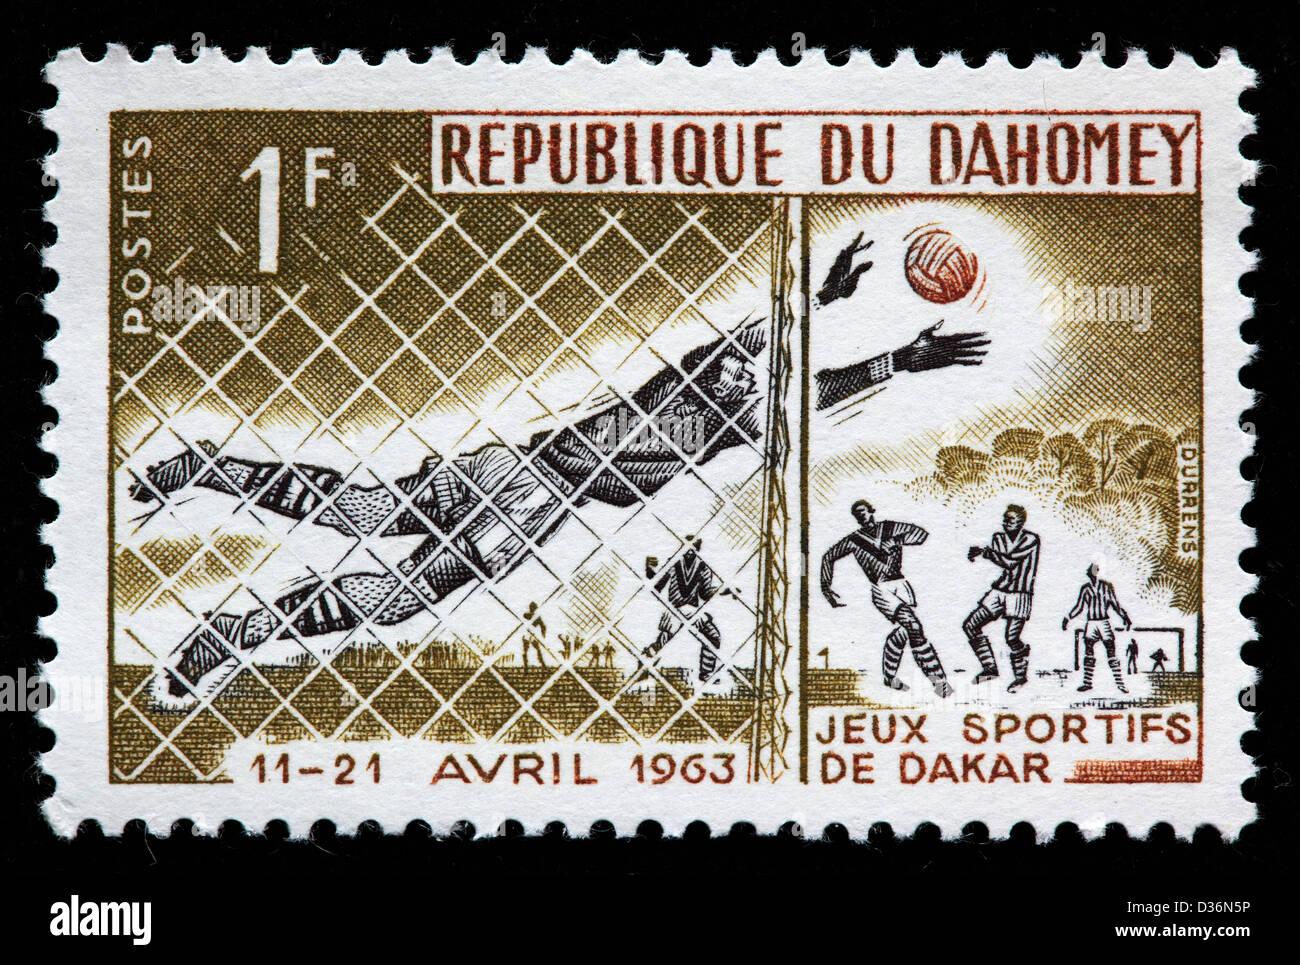 Soccer goalkeeper, Friendship Games, Dakar, postage stamp, Dahomey,1963 - Stock Image